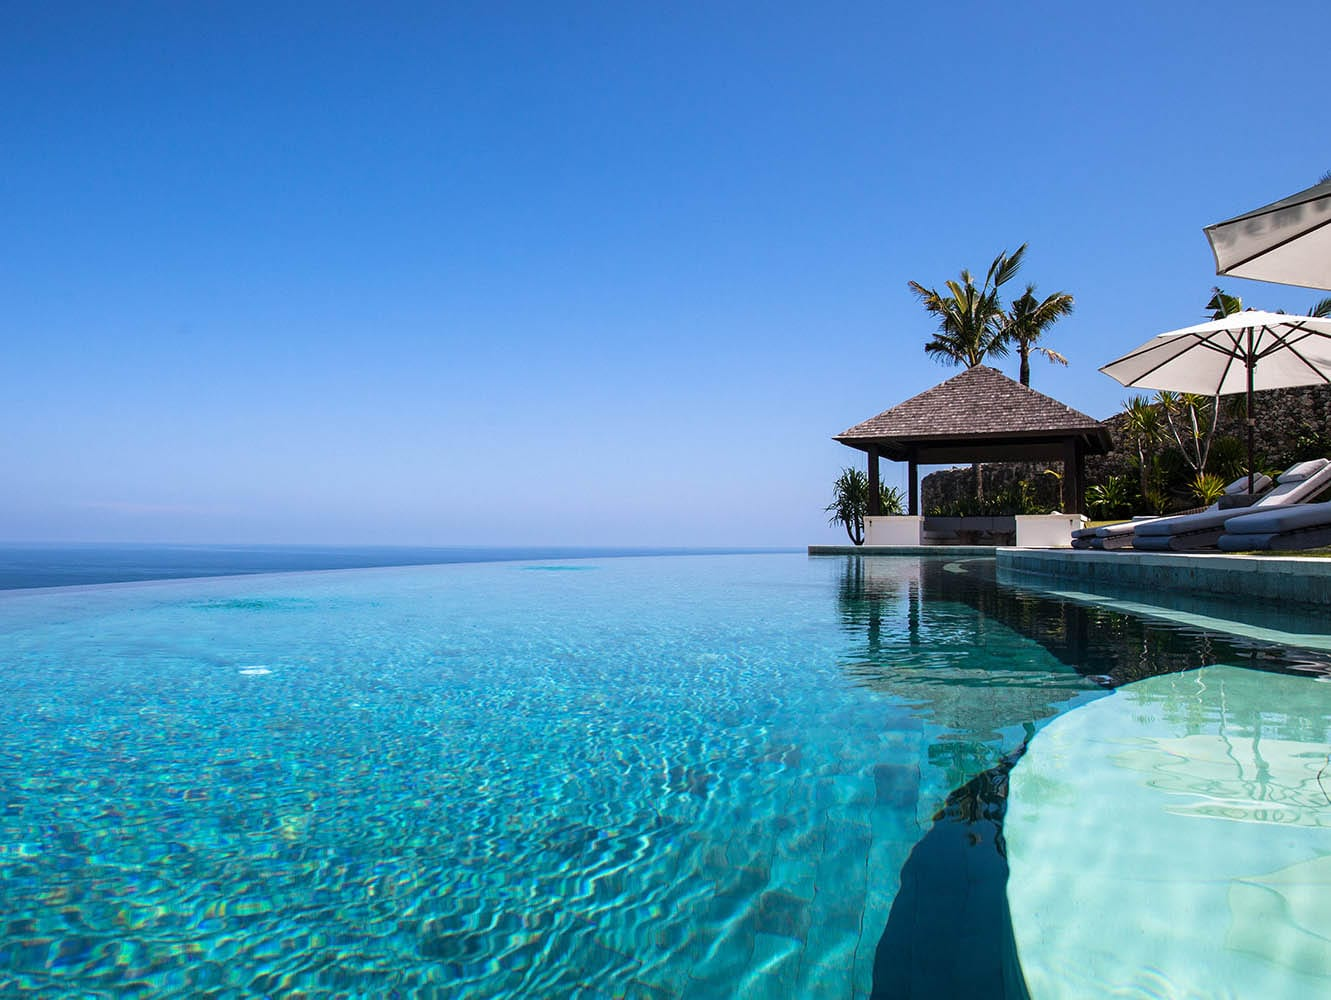 Beachfrontvillasbali Com: Luxury Bali Villas, Retreats And Indonesian Yacht Charters